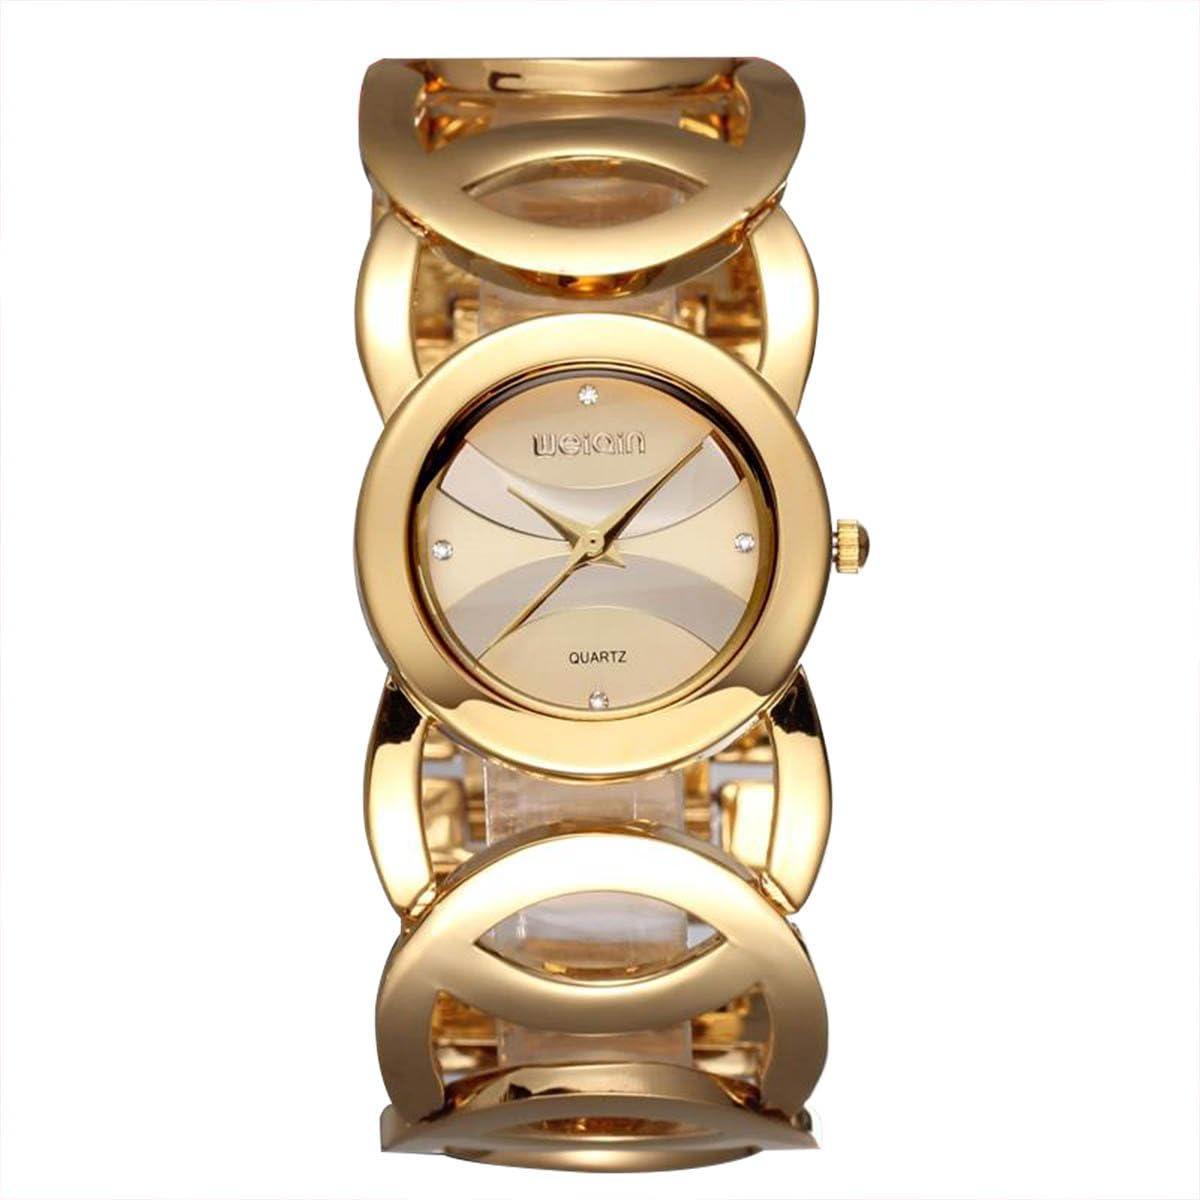 Gosasa Women s FMDJM117 Gold-Tone Watch with Link Bracelet